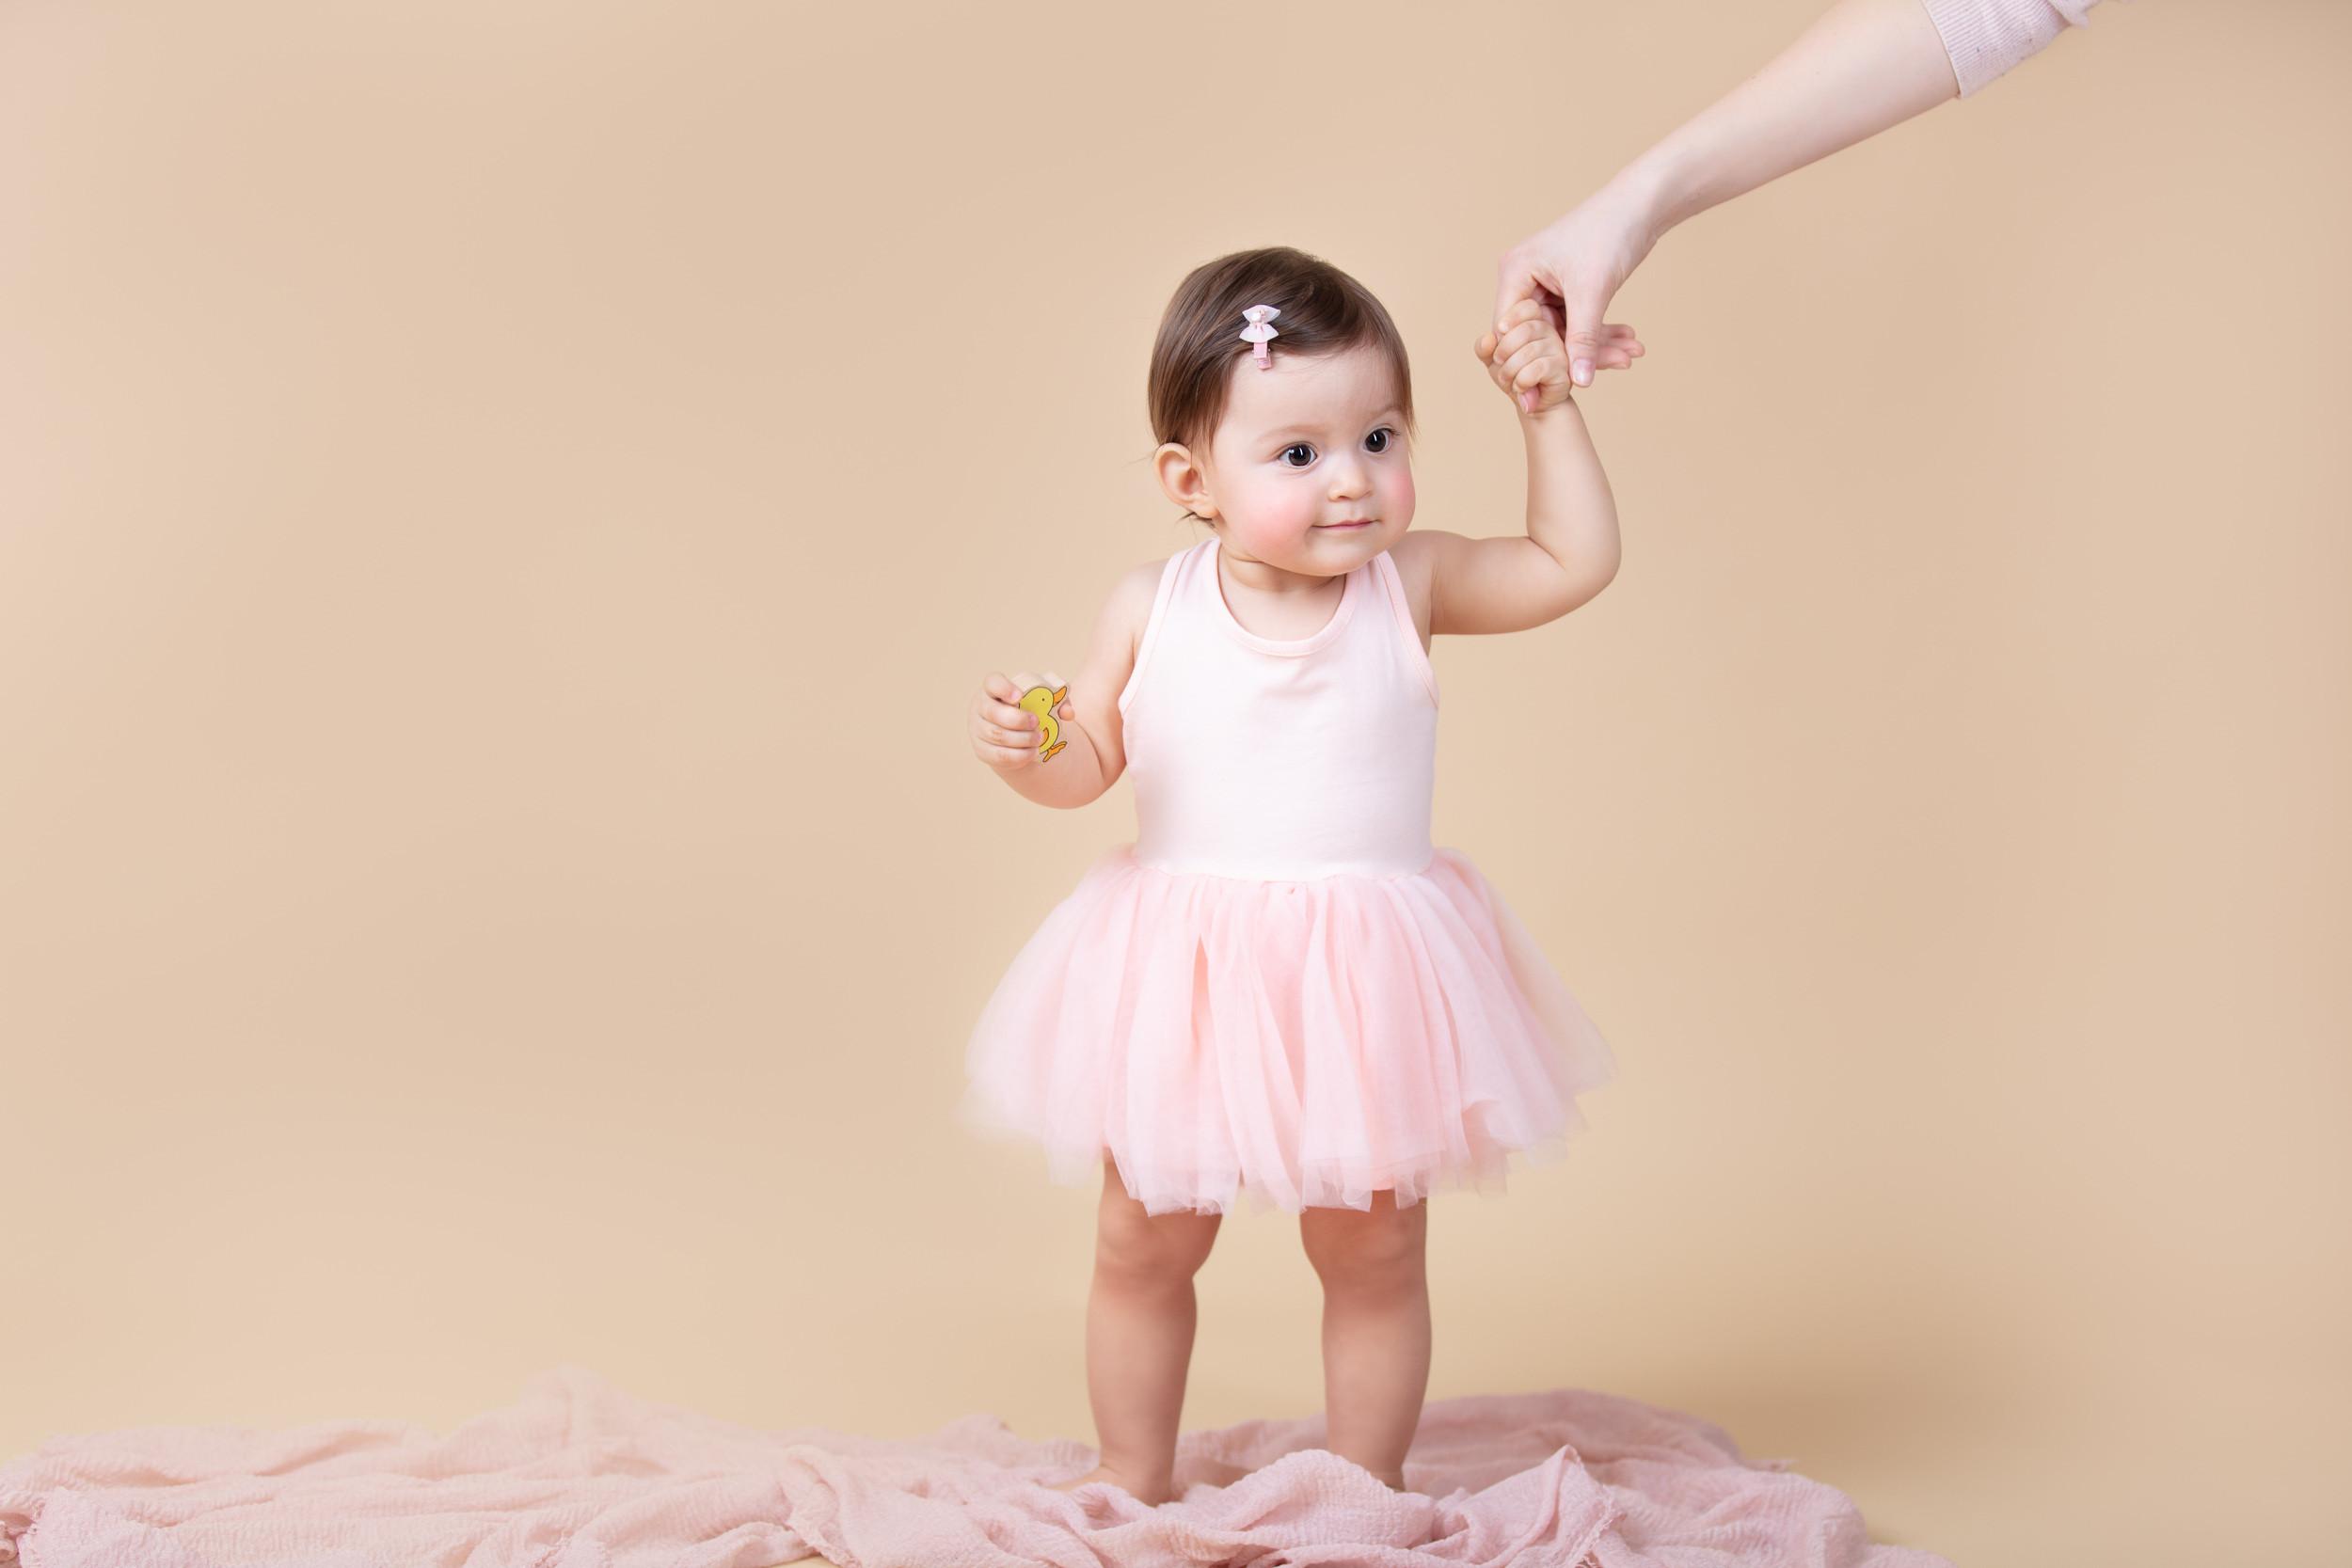 Babys Erste Schritte [_V6A1493] VUS